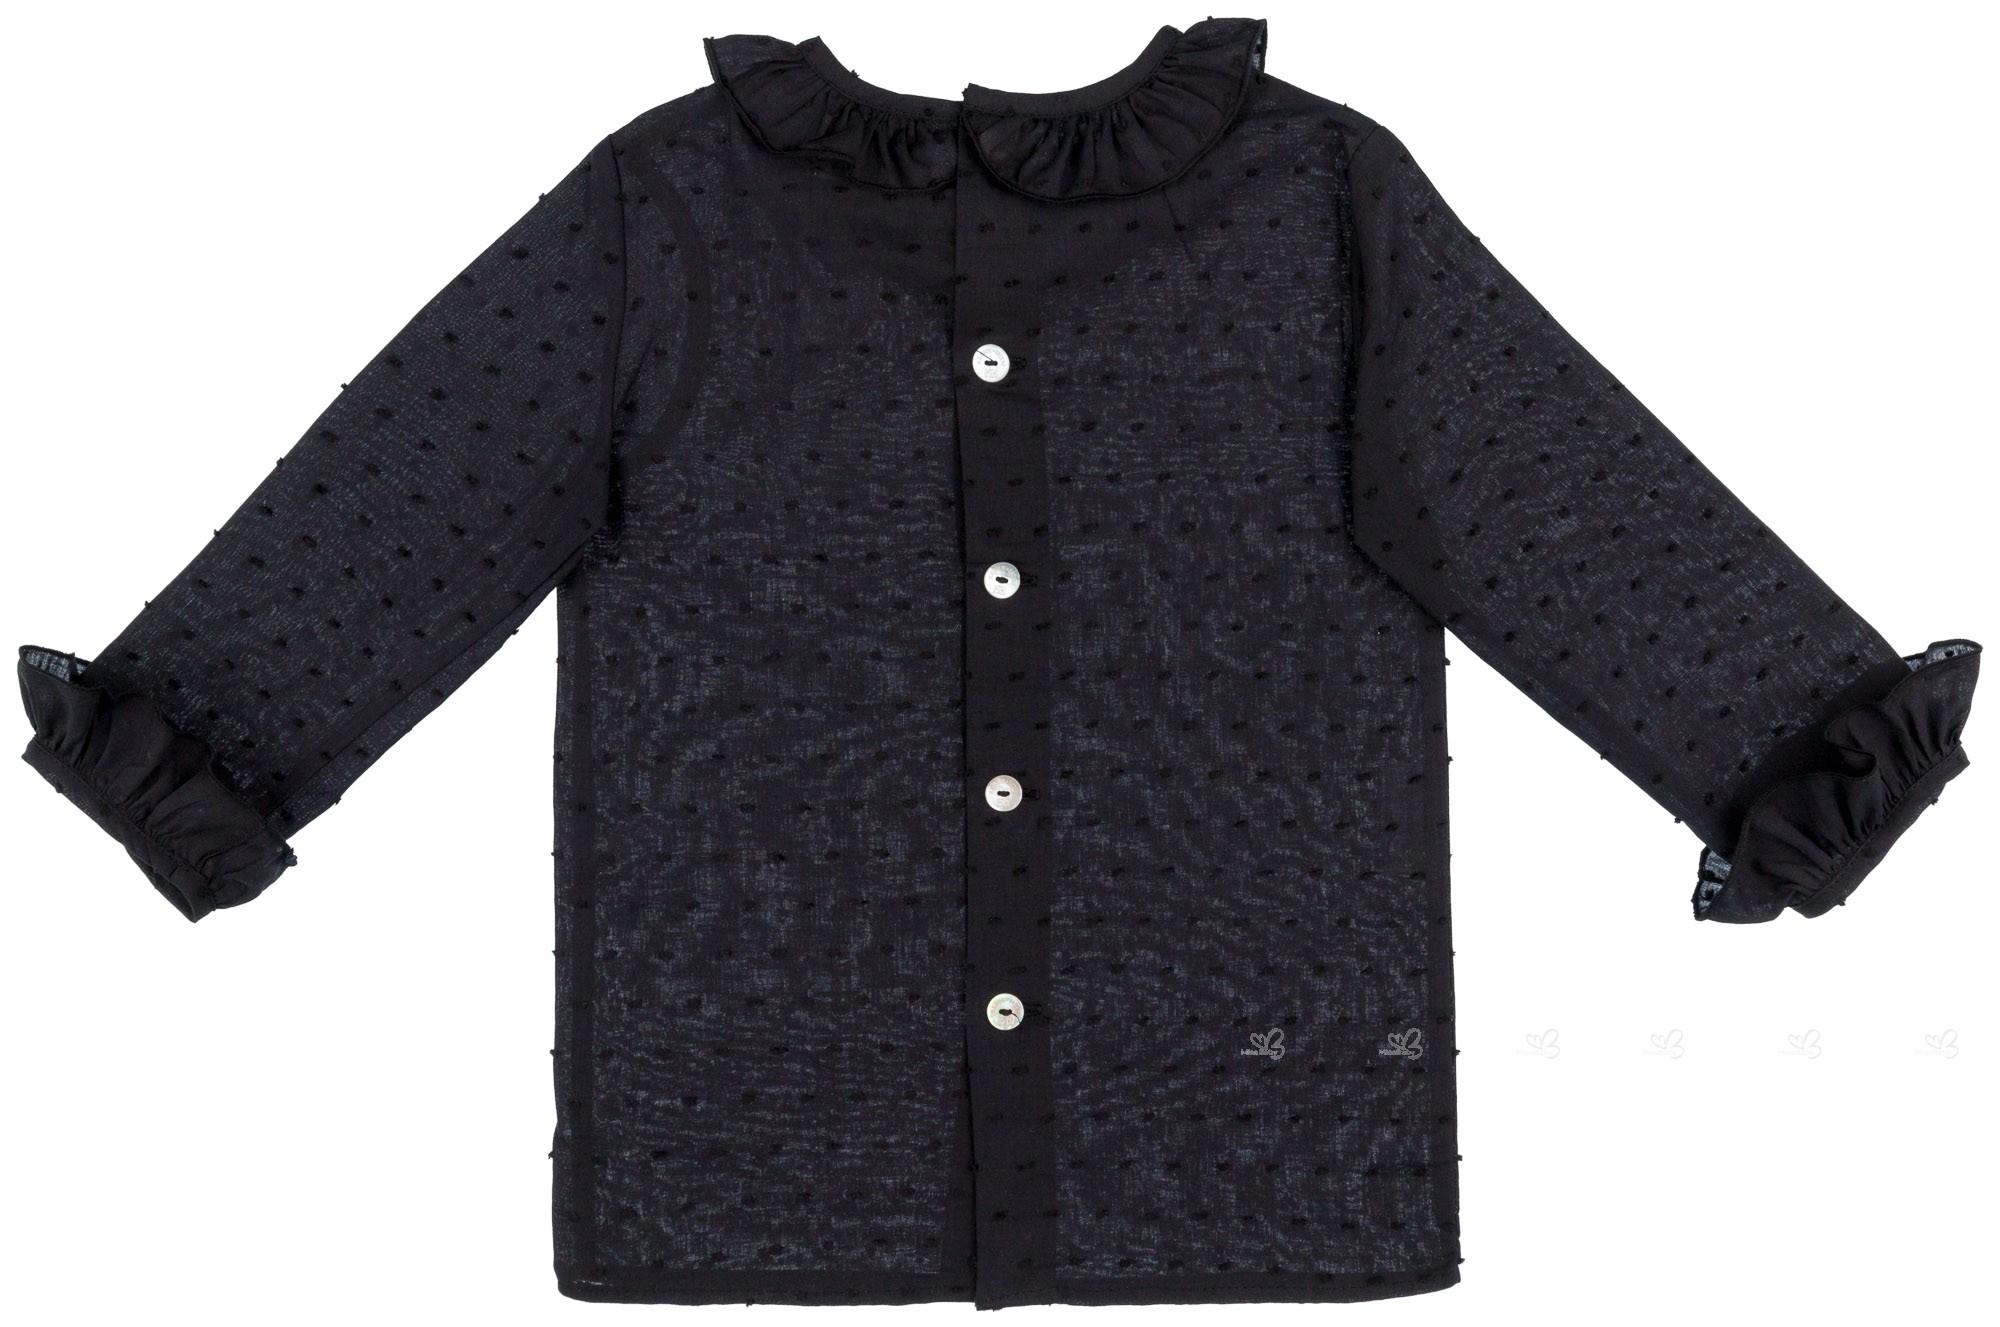 ... Girls Black Blouse   Beige Penguin Ruffle Dungaree Shorts Set ... b764fbbae1b